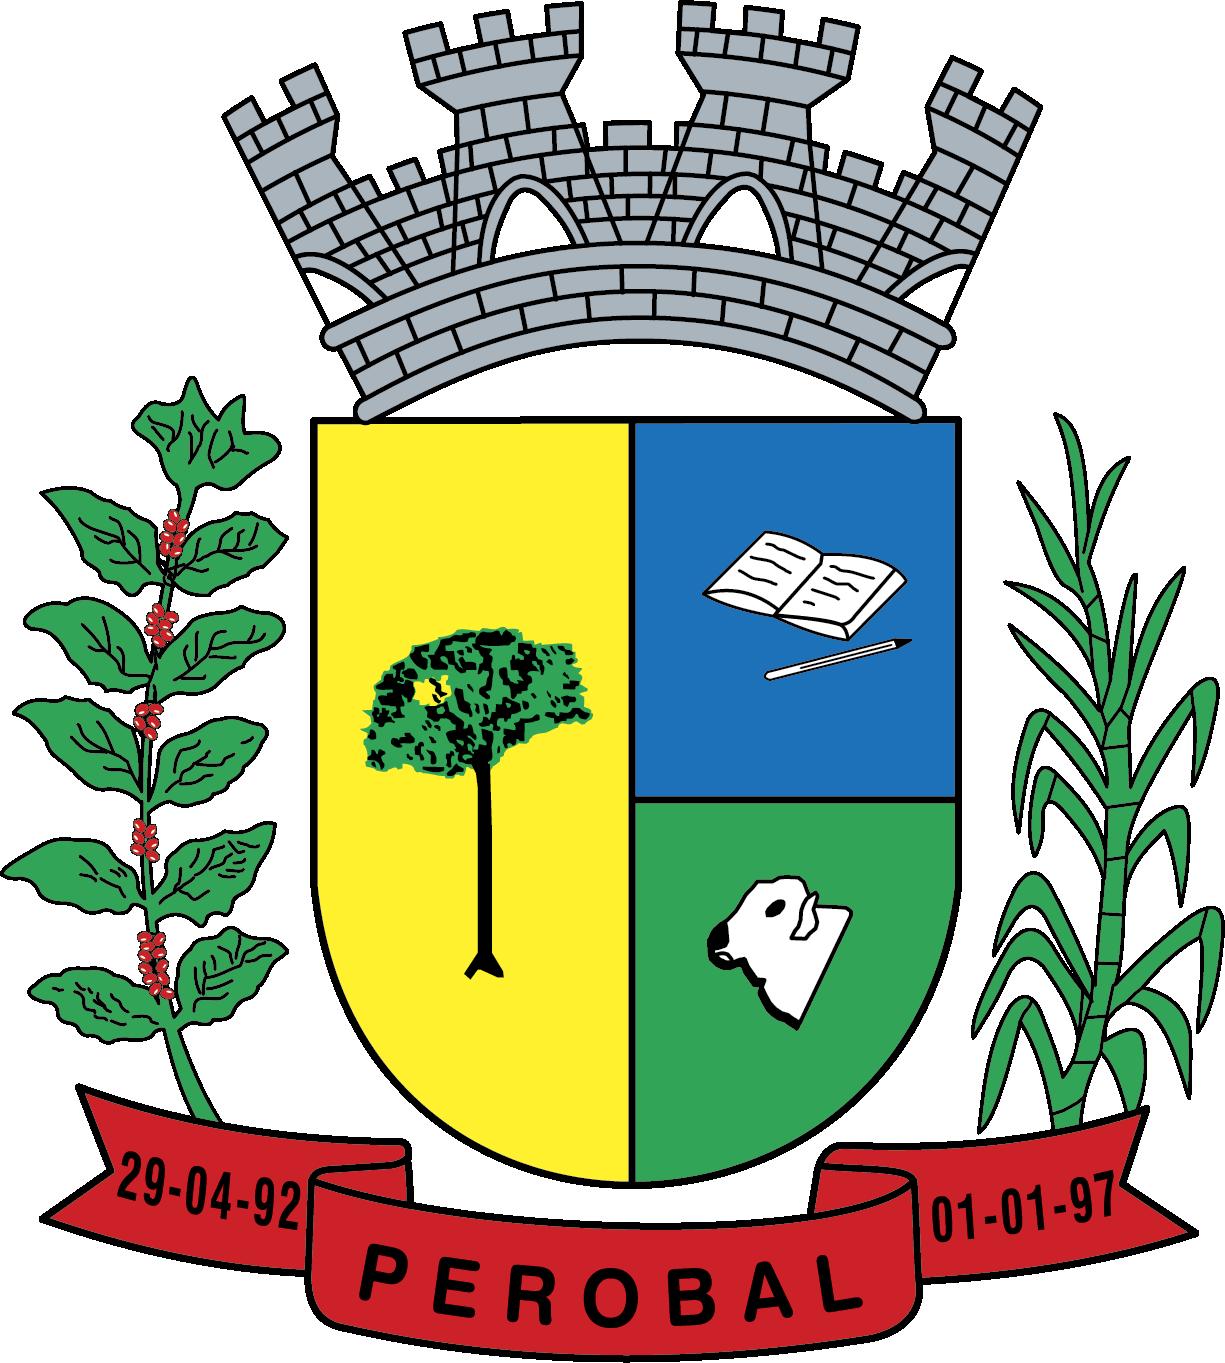 PREFEITURA MUNICIPAL DE PEROBAL